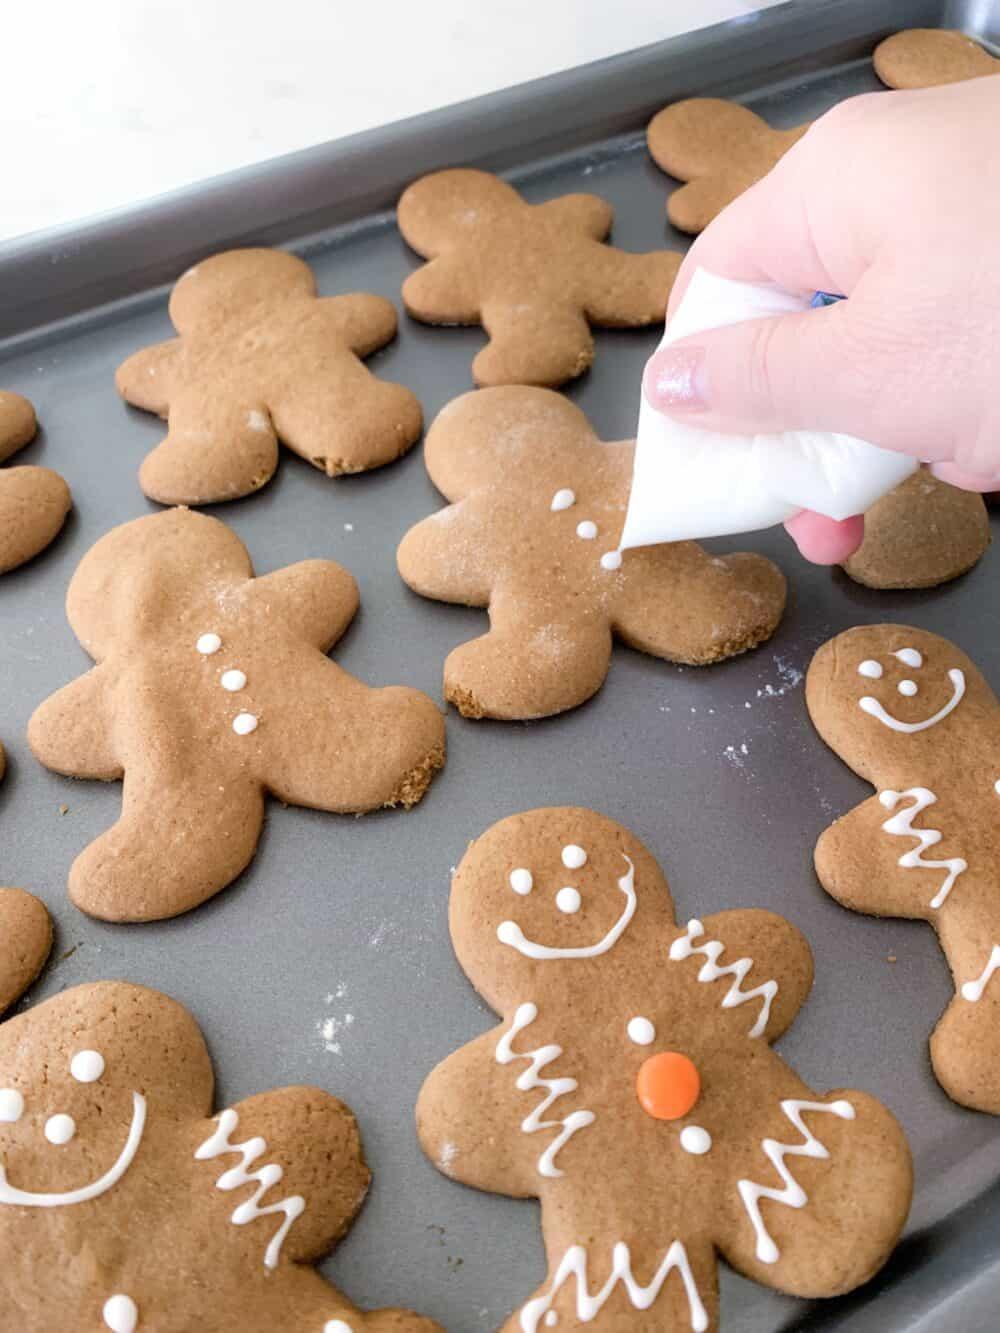 icing gingerbread man cookies